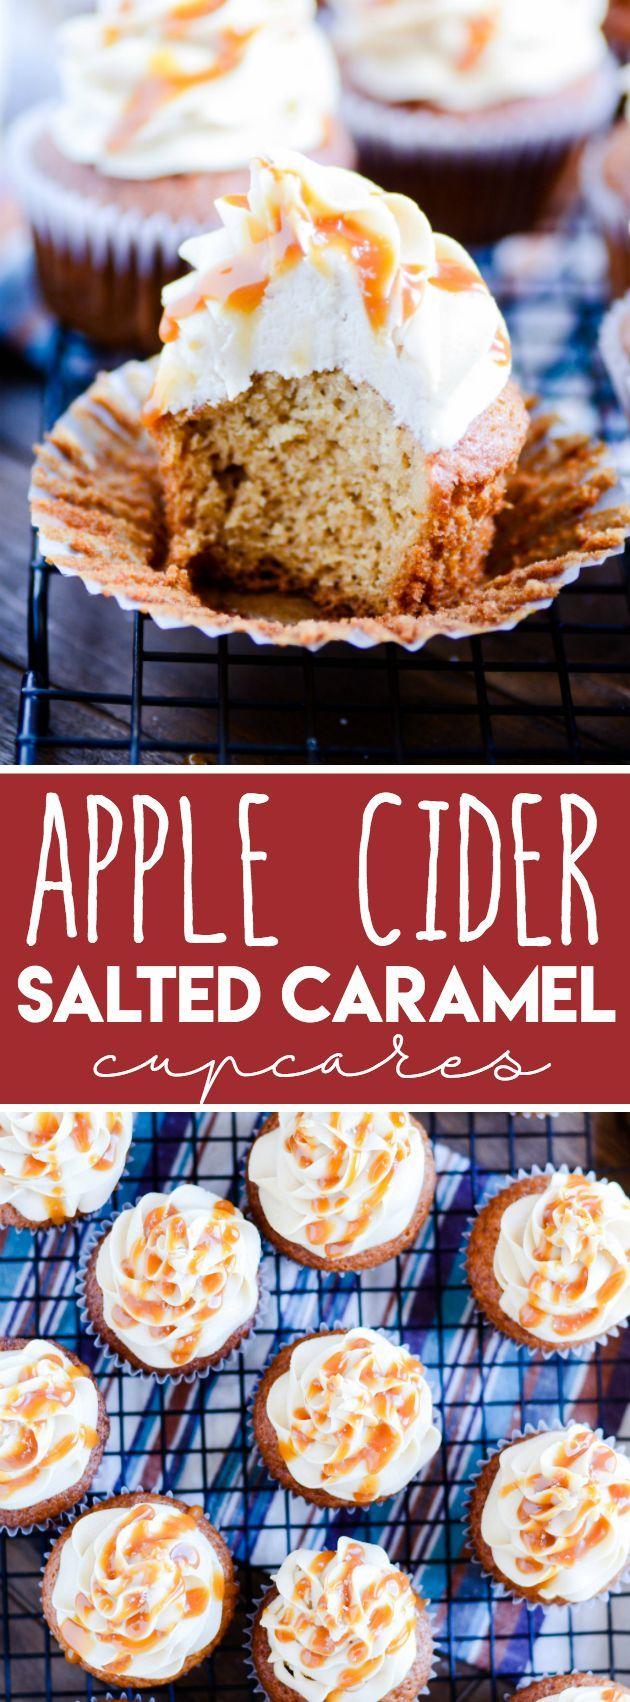 Apple Cider Cupcakes & Salted Caramel Buttercream http://www.somethingswanky.com/apple-cider-cupcakes-salted-caramel/?utm_campaign=coschedule&utm_source=pinterest&utm_medium=Something%20Swanky&utm_content=Apple%20Cider%20Cupcakes%20and%20Salted%20Caramel%20Buttercream